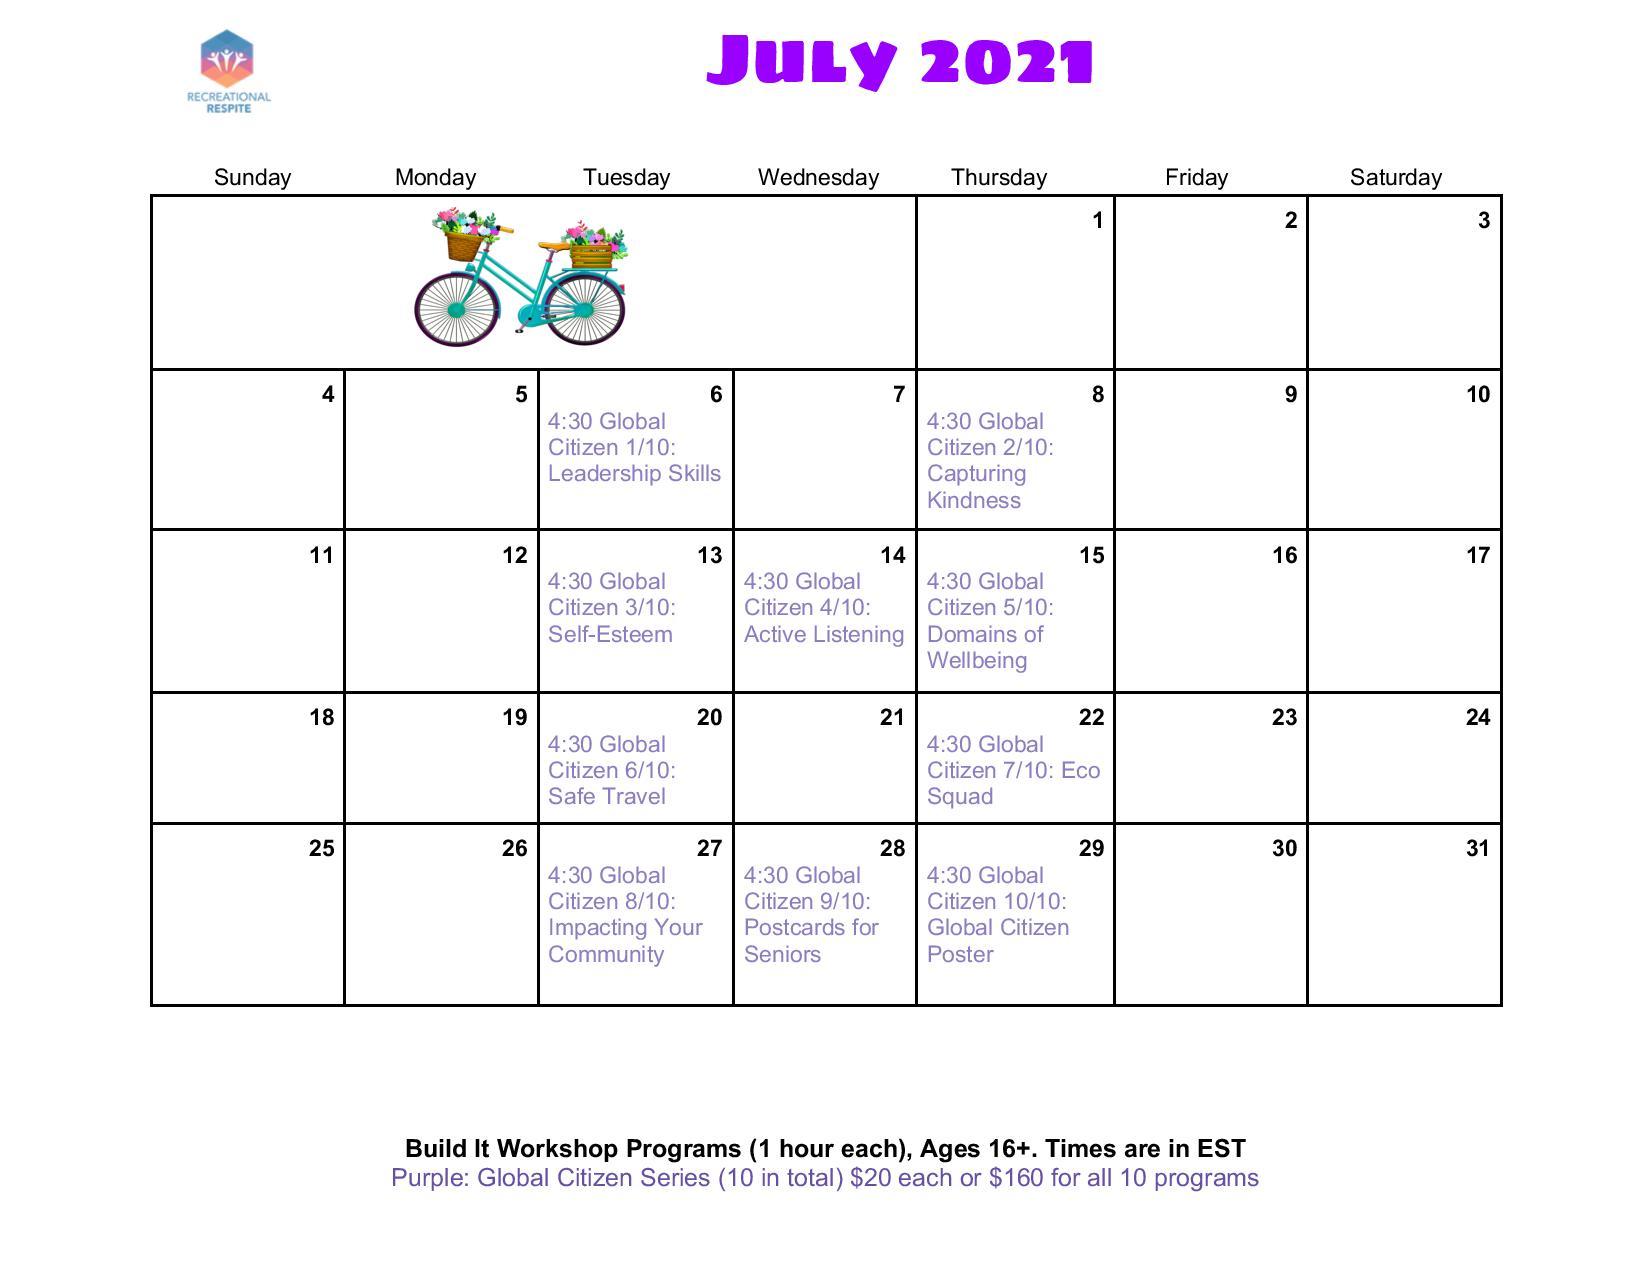 Build it Workshop calendar of programs